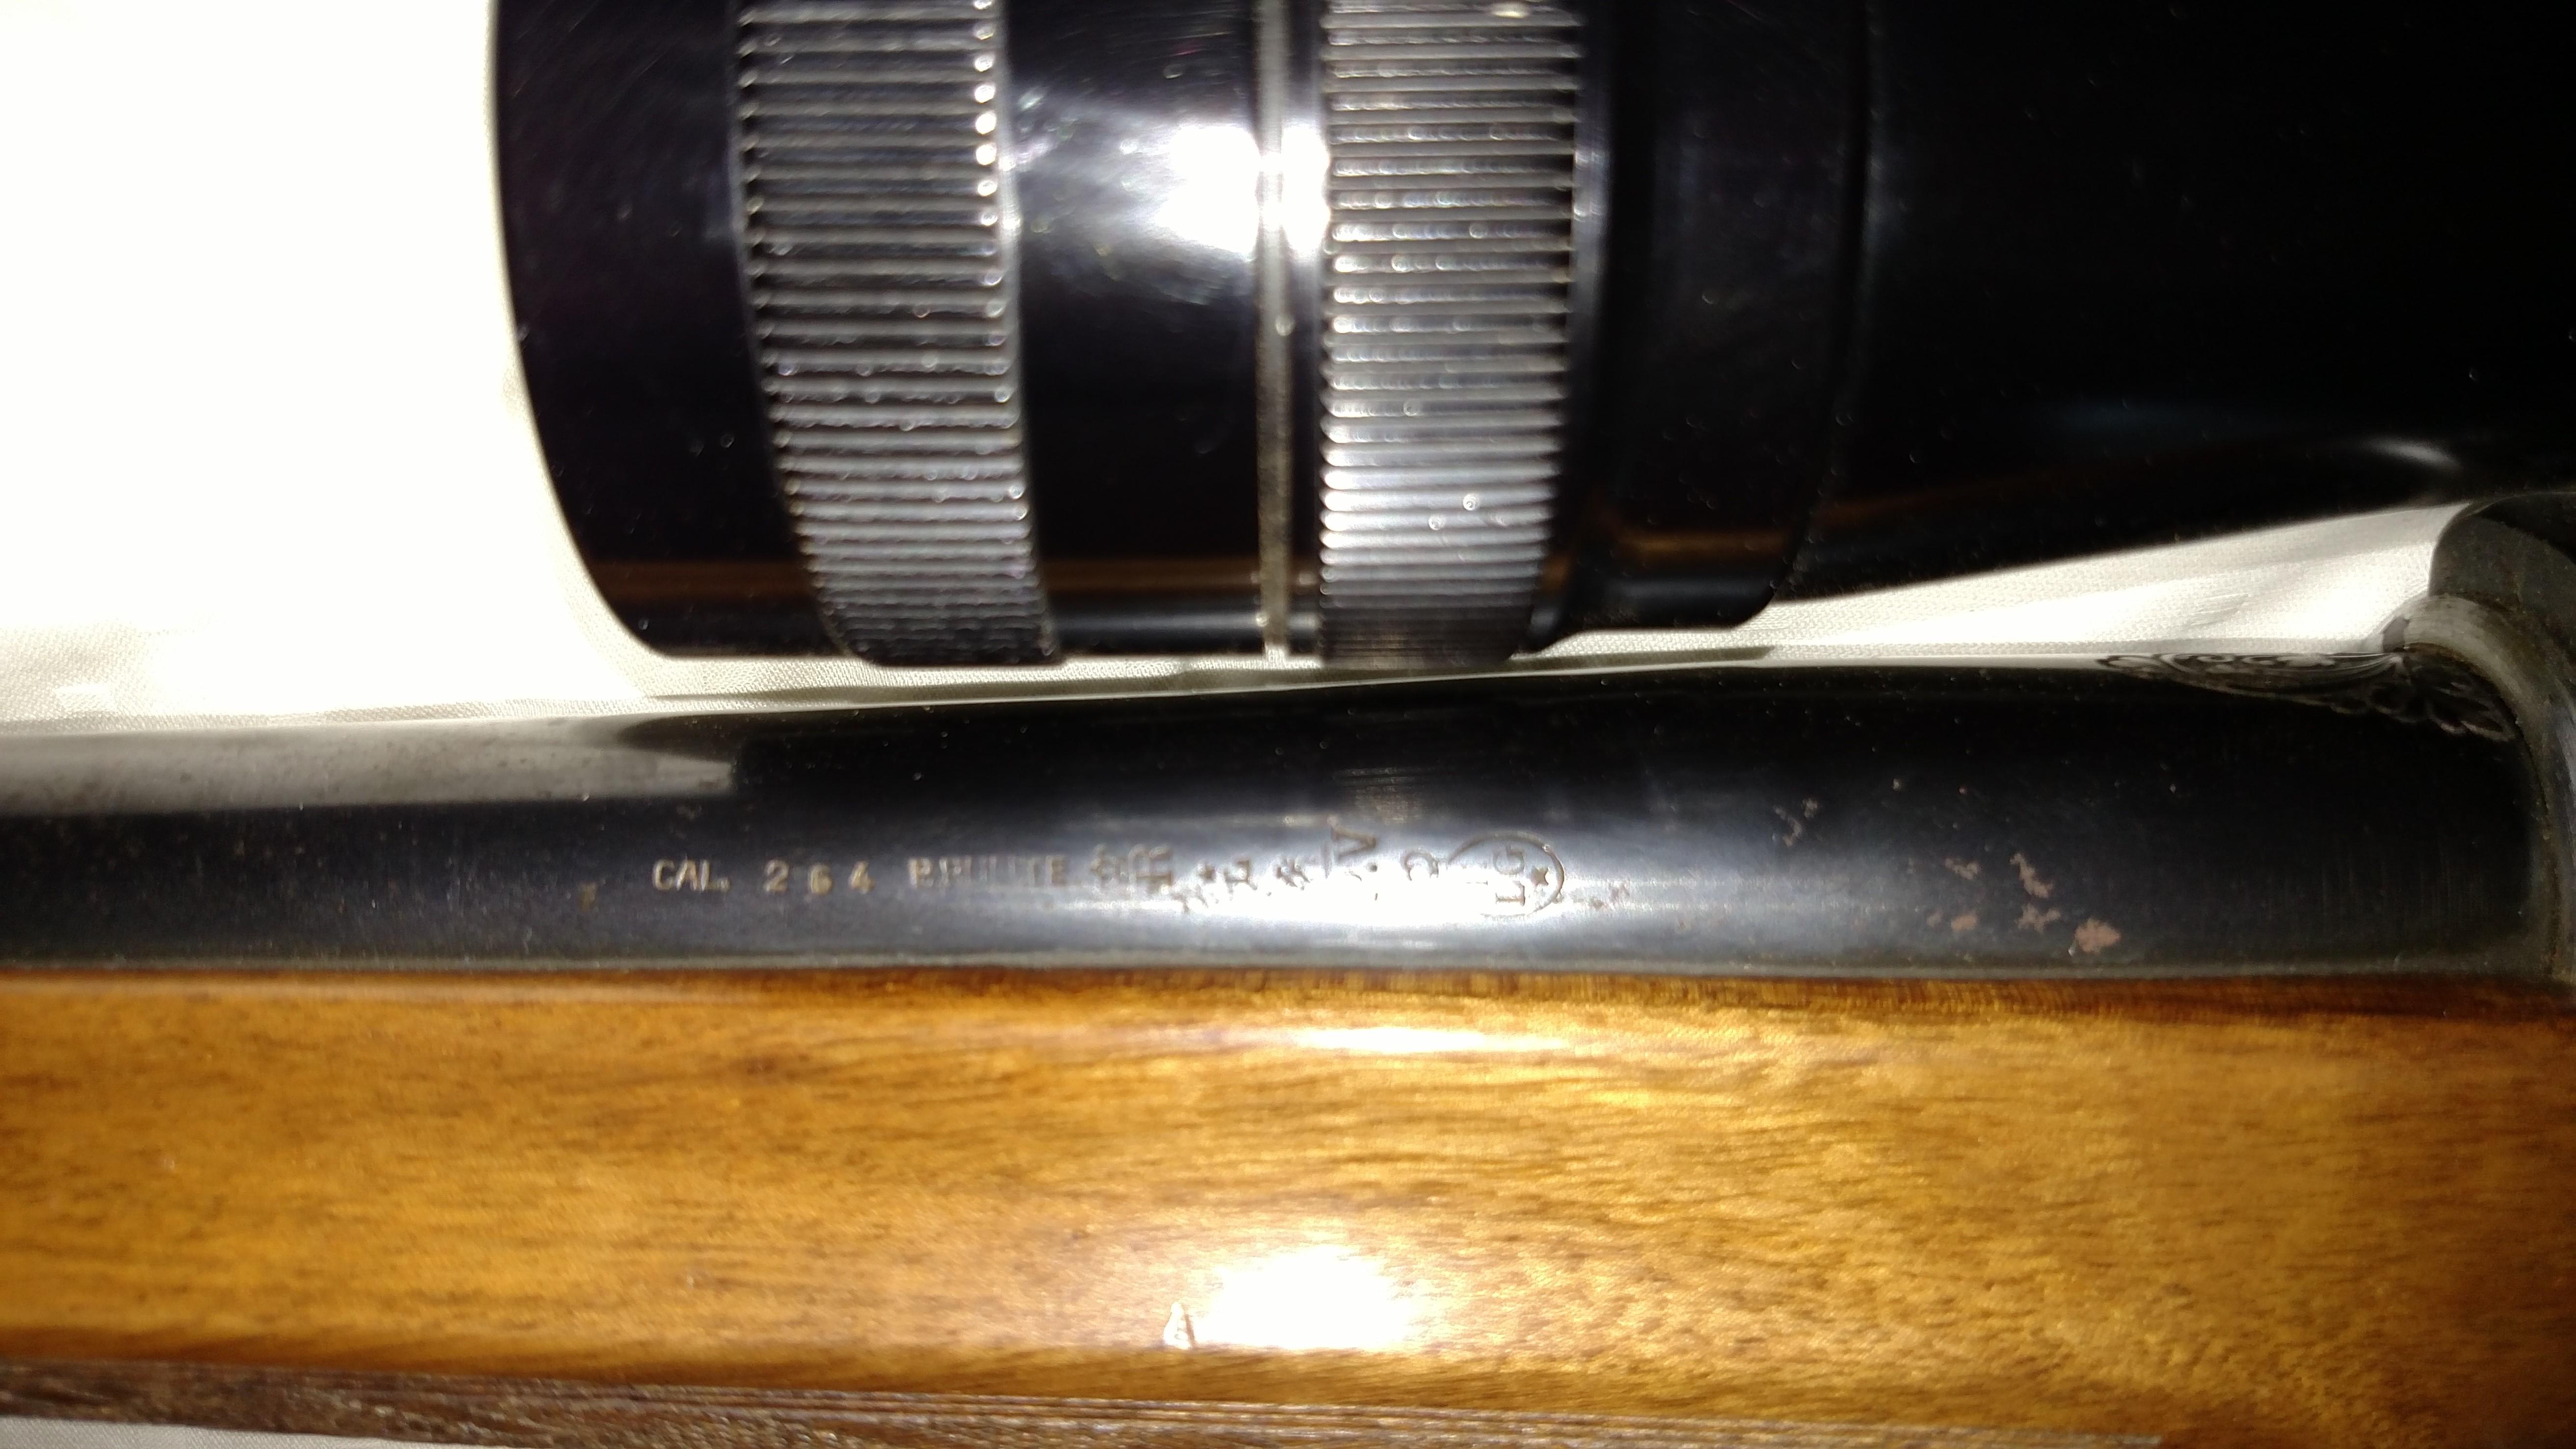 15-07-07_rifle 2.jpg